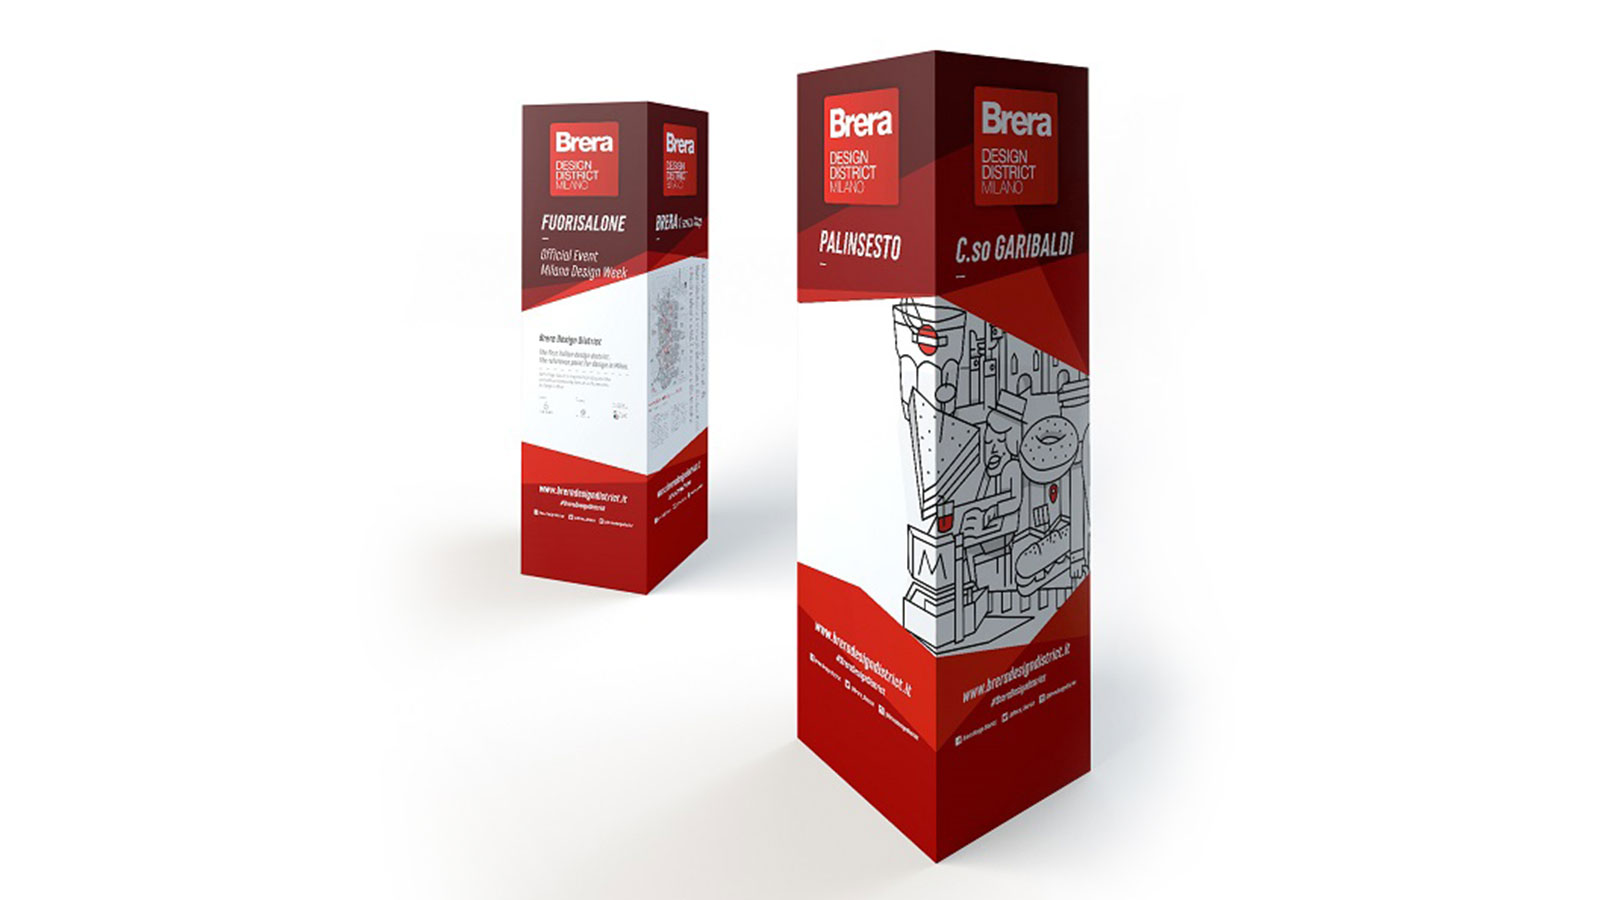 ABS Group - Partner Brera Design District 2016